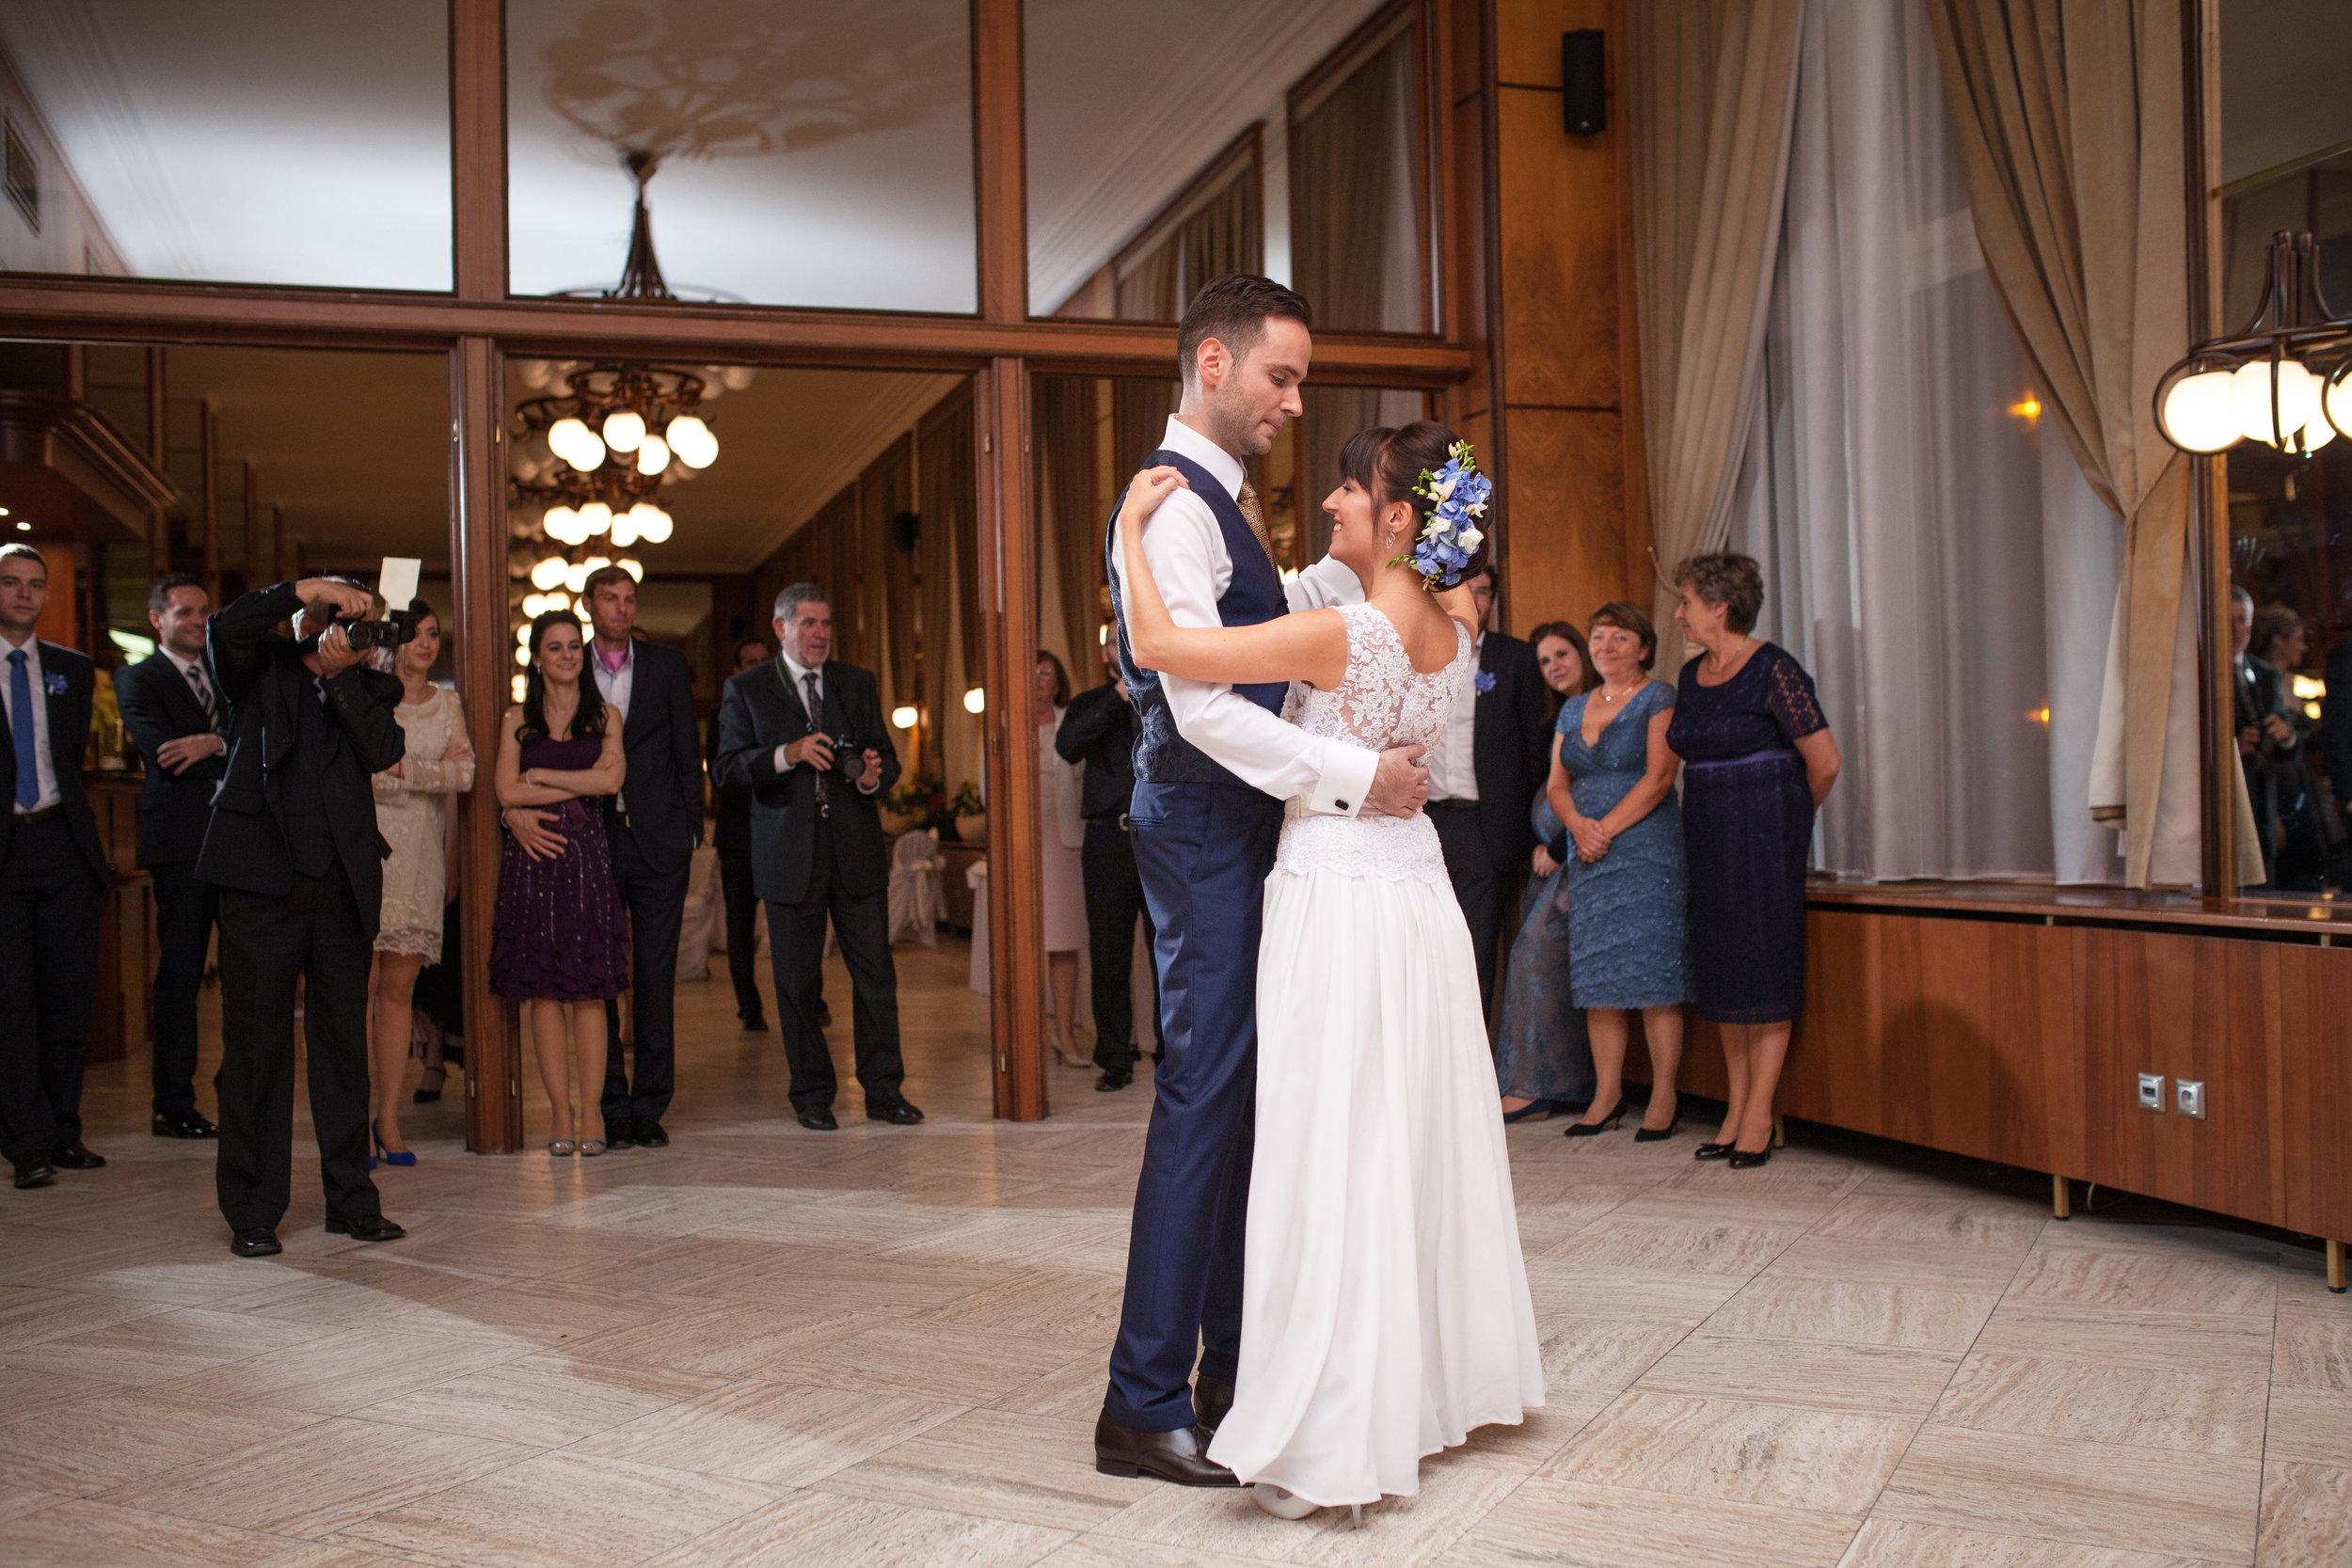 destination-wedding-photographer-slovakia-bratislava-reception-hotel-dance.jpg